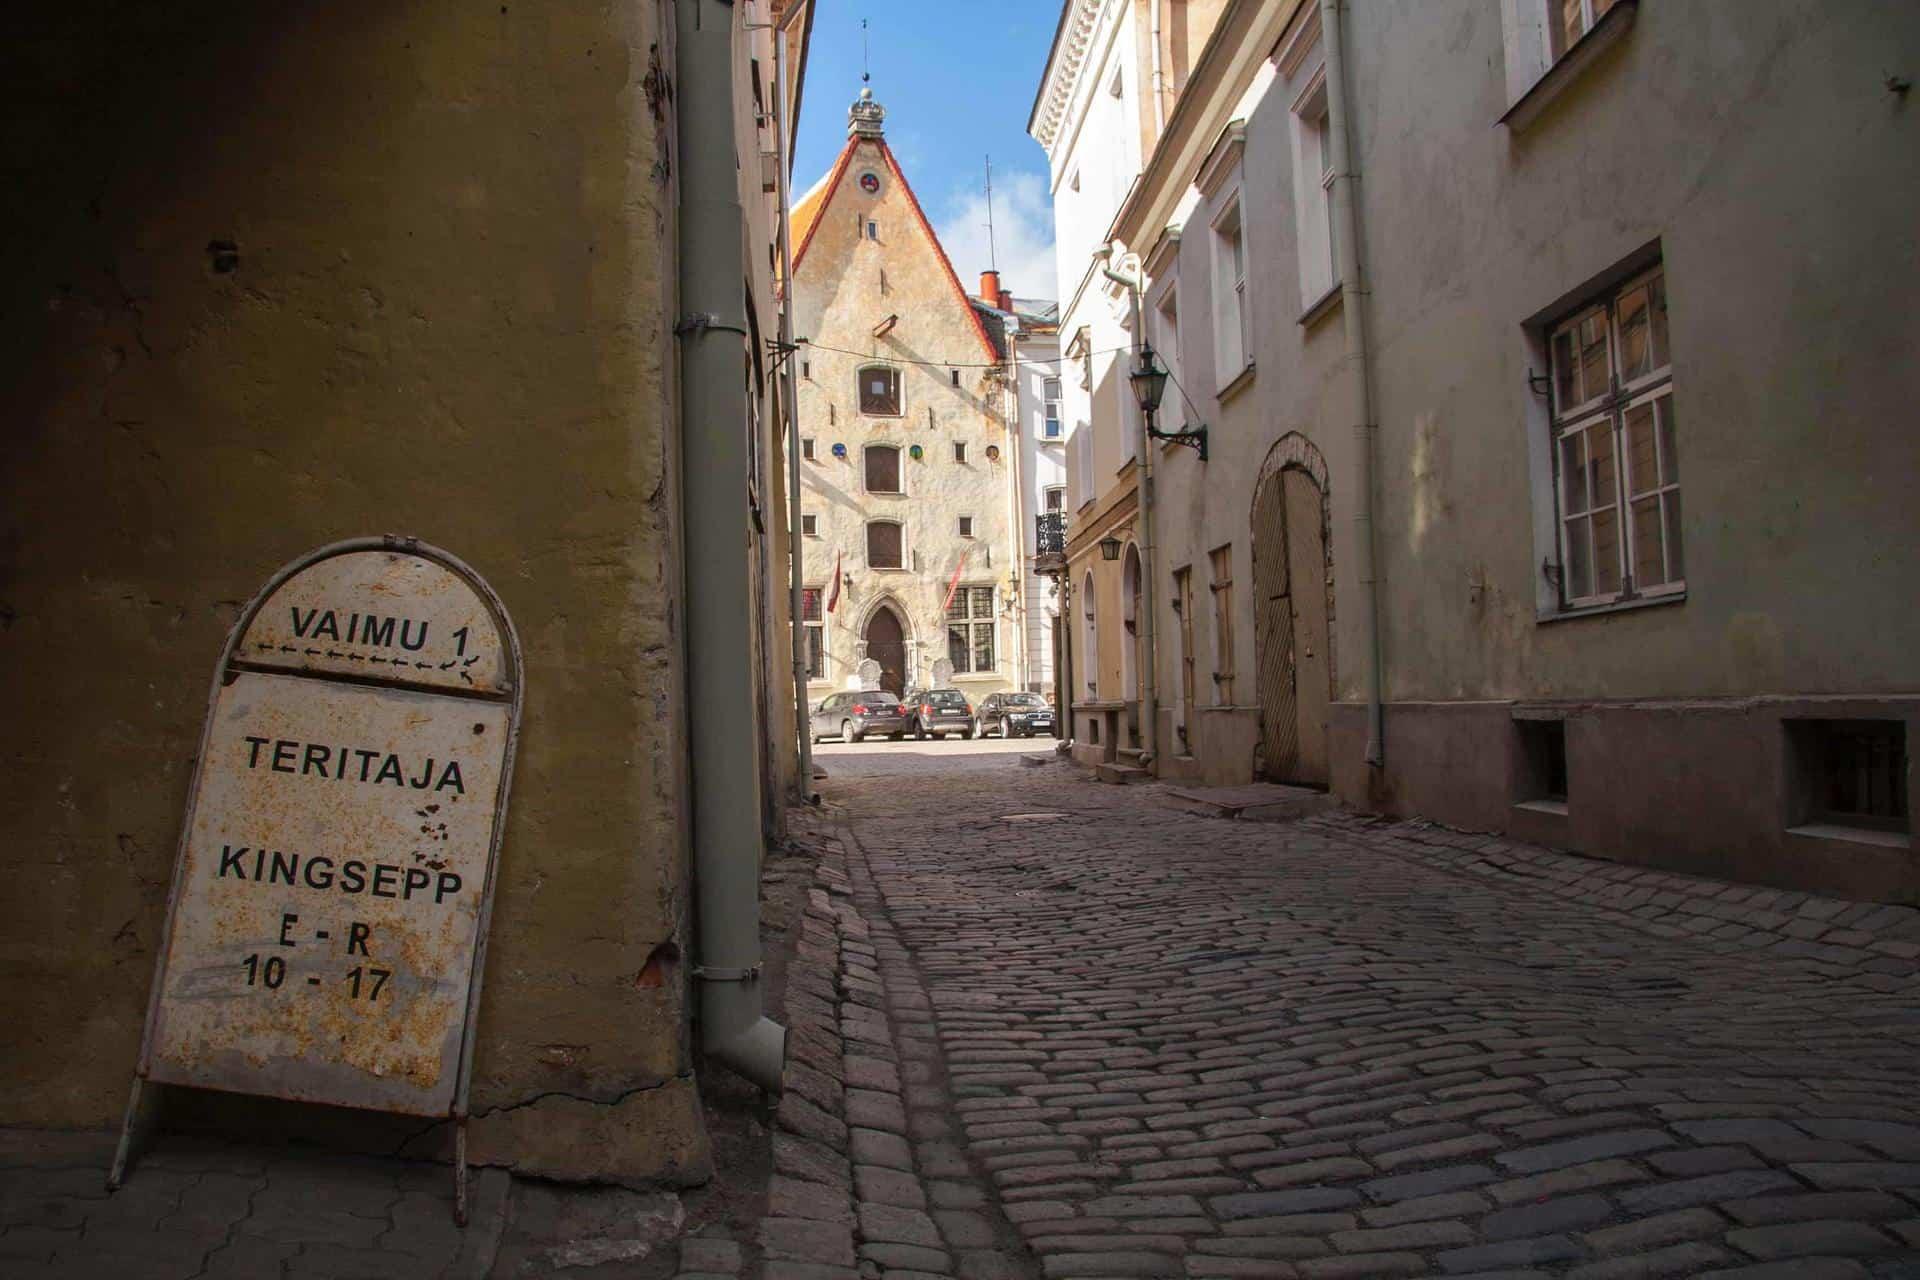 A small cobblestoned street